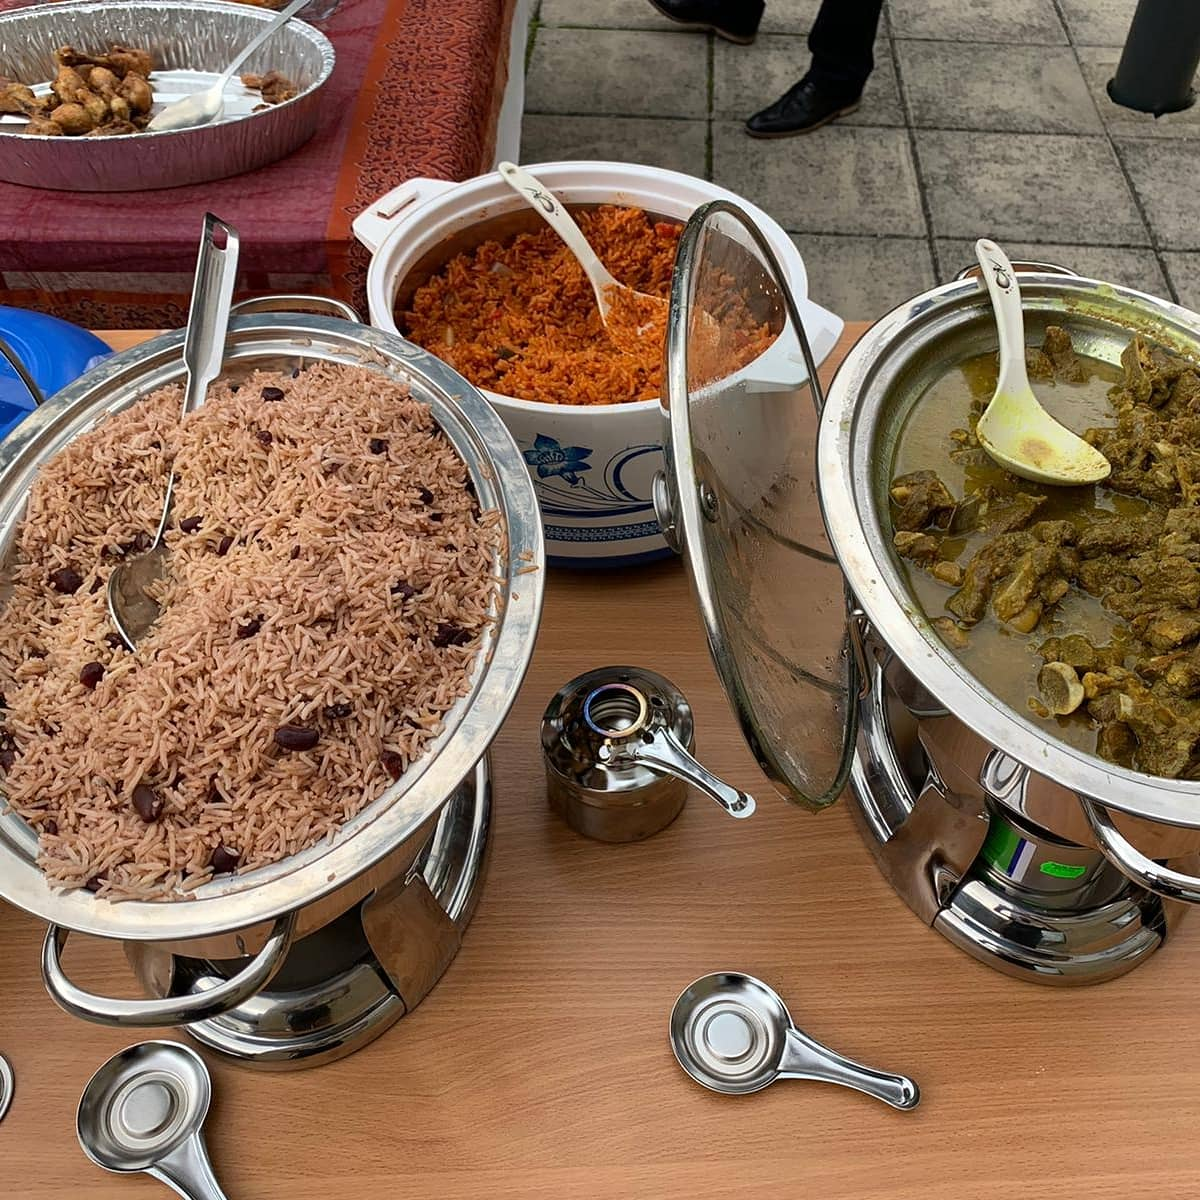 Summer bbq fun! Cast you votes... Jollof or Rice & peas? 🍚😋 #summerbbq #newham https://t.co/kIt8znKvJD